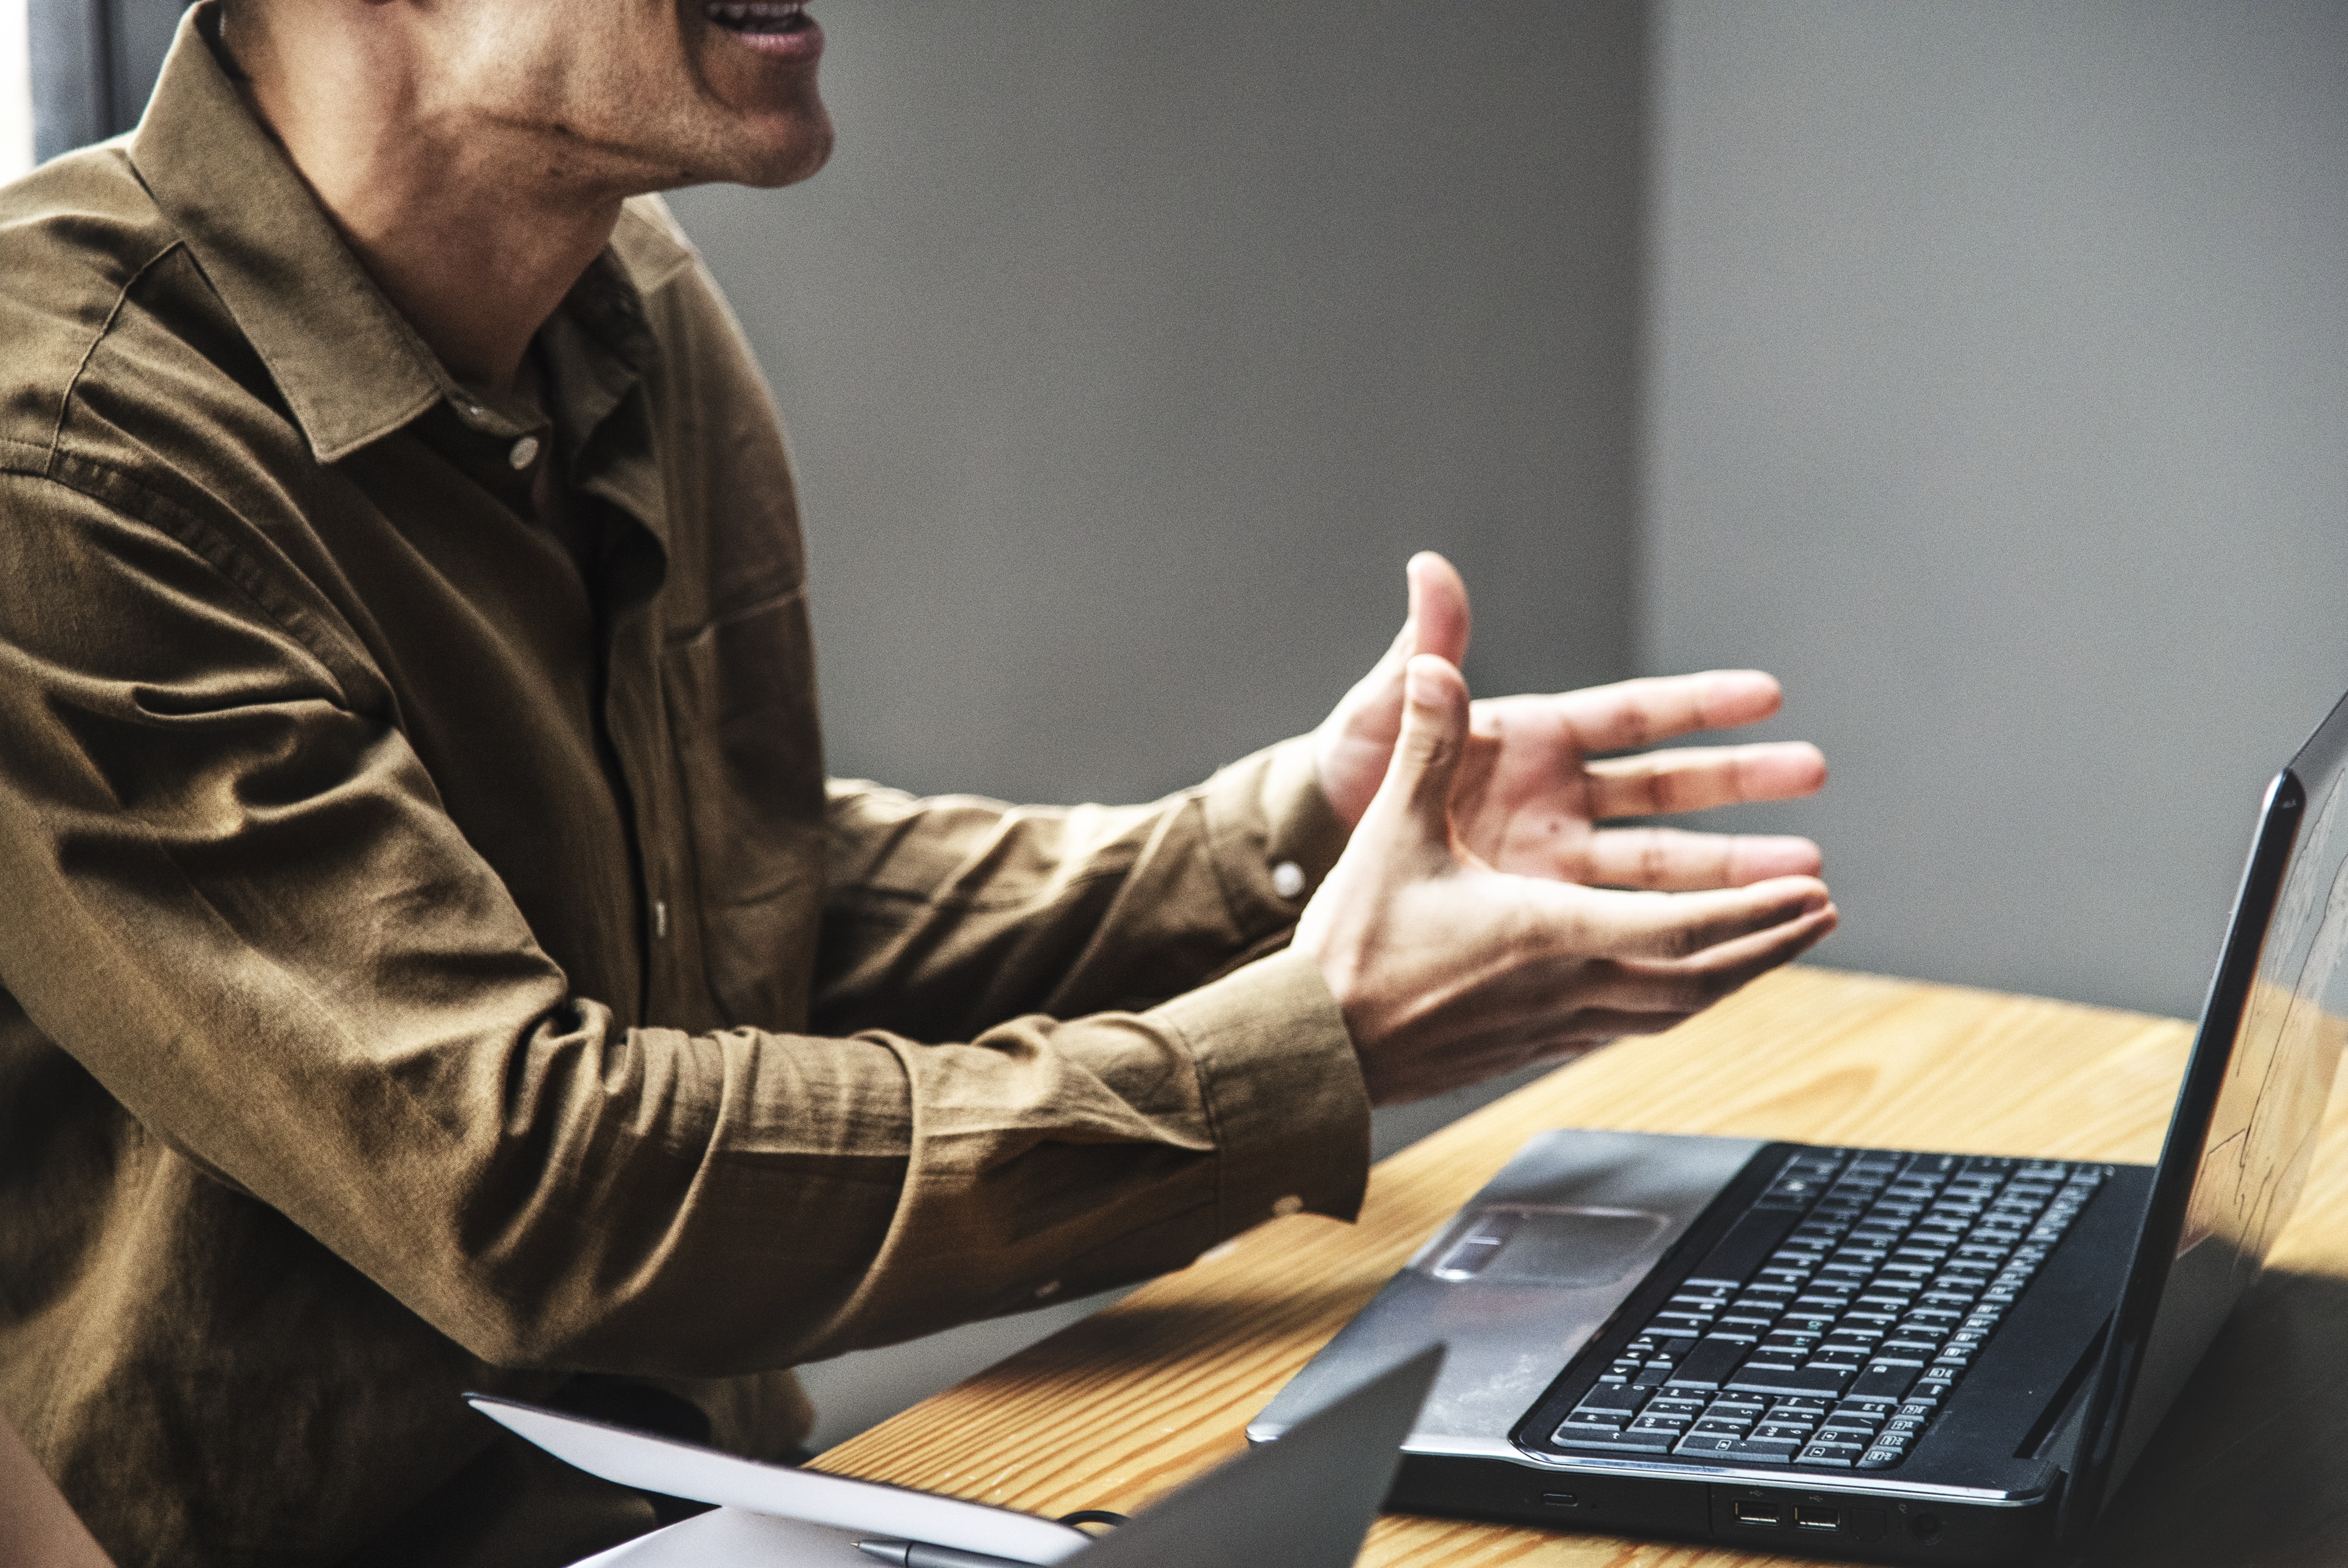 raging man in front of laptop on desk